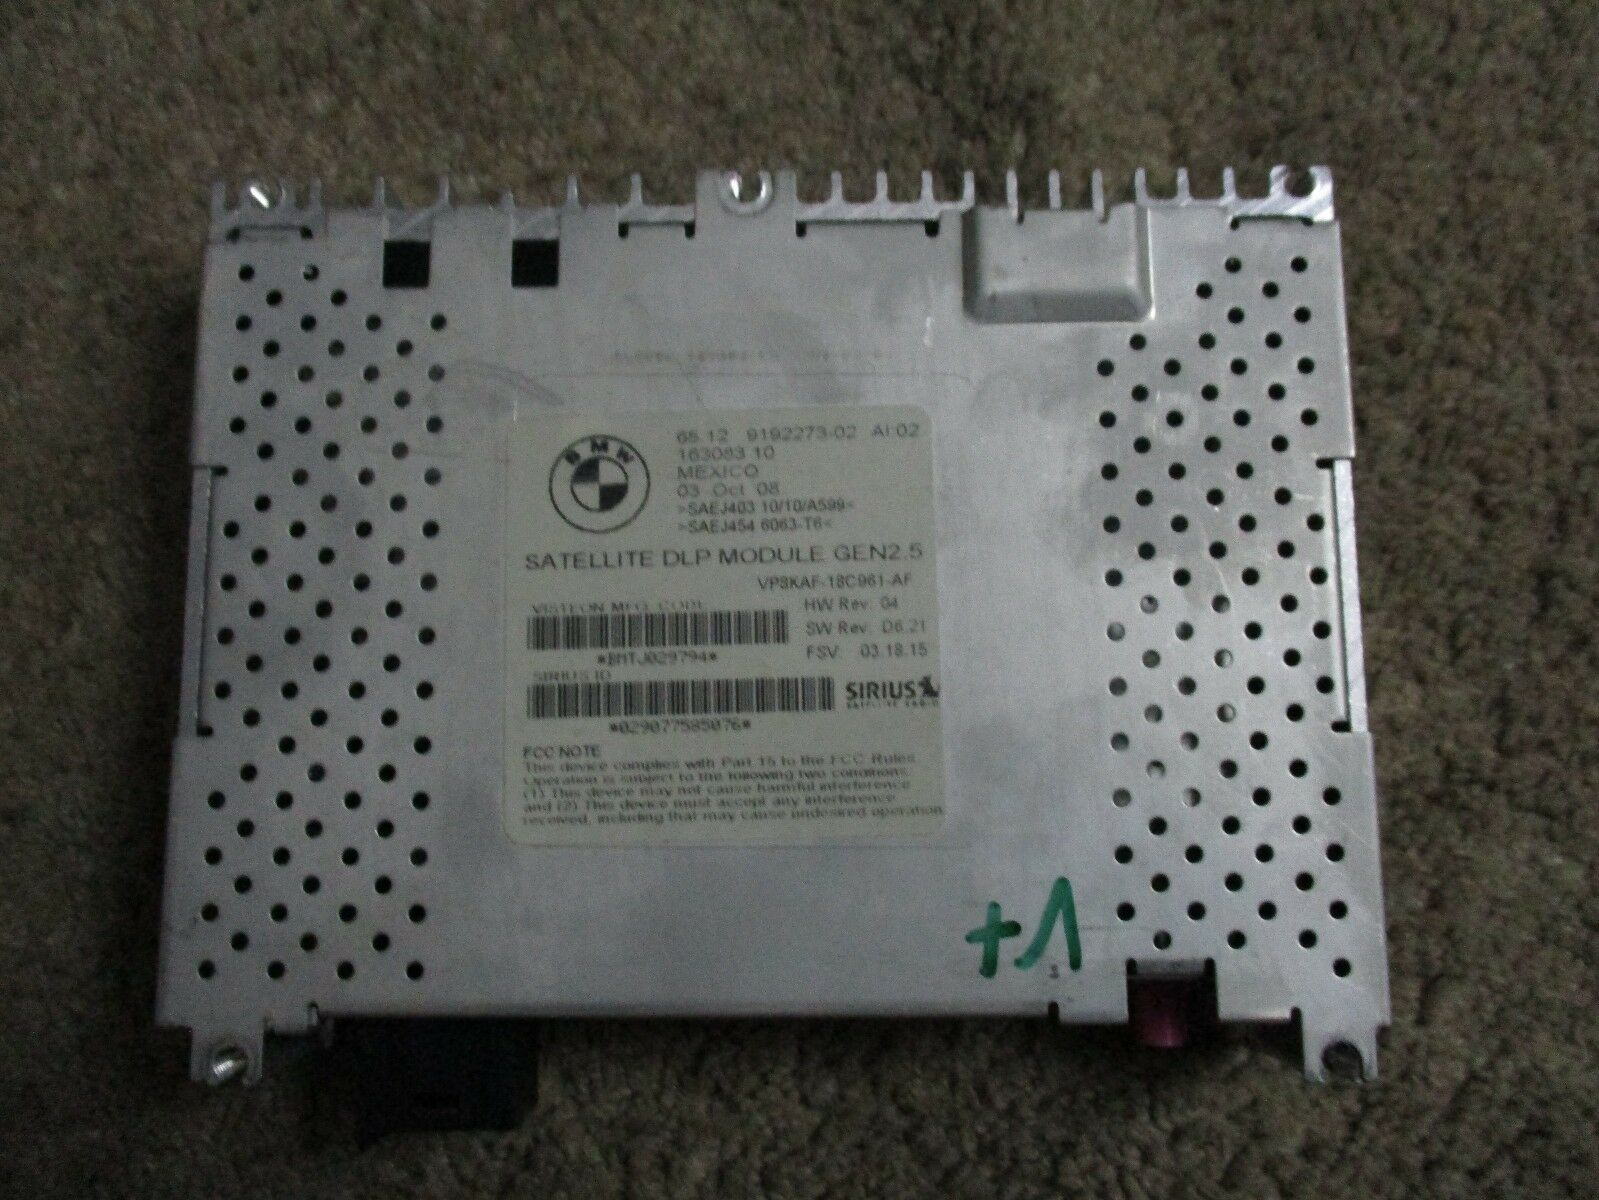 Used Bmw M6 Engine Computers For Sale 2014 Fuse Box 2007 2011 535 X5 X6 X3 M5 Mini Cooper Sirius Satellite Dlp Module